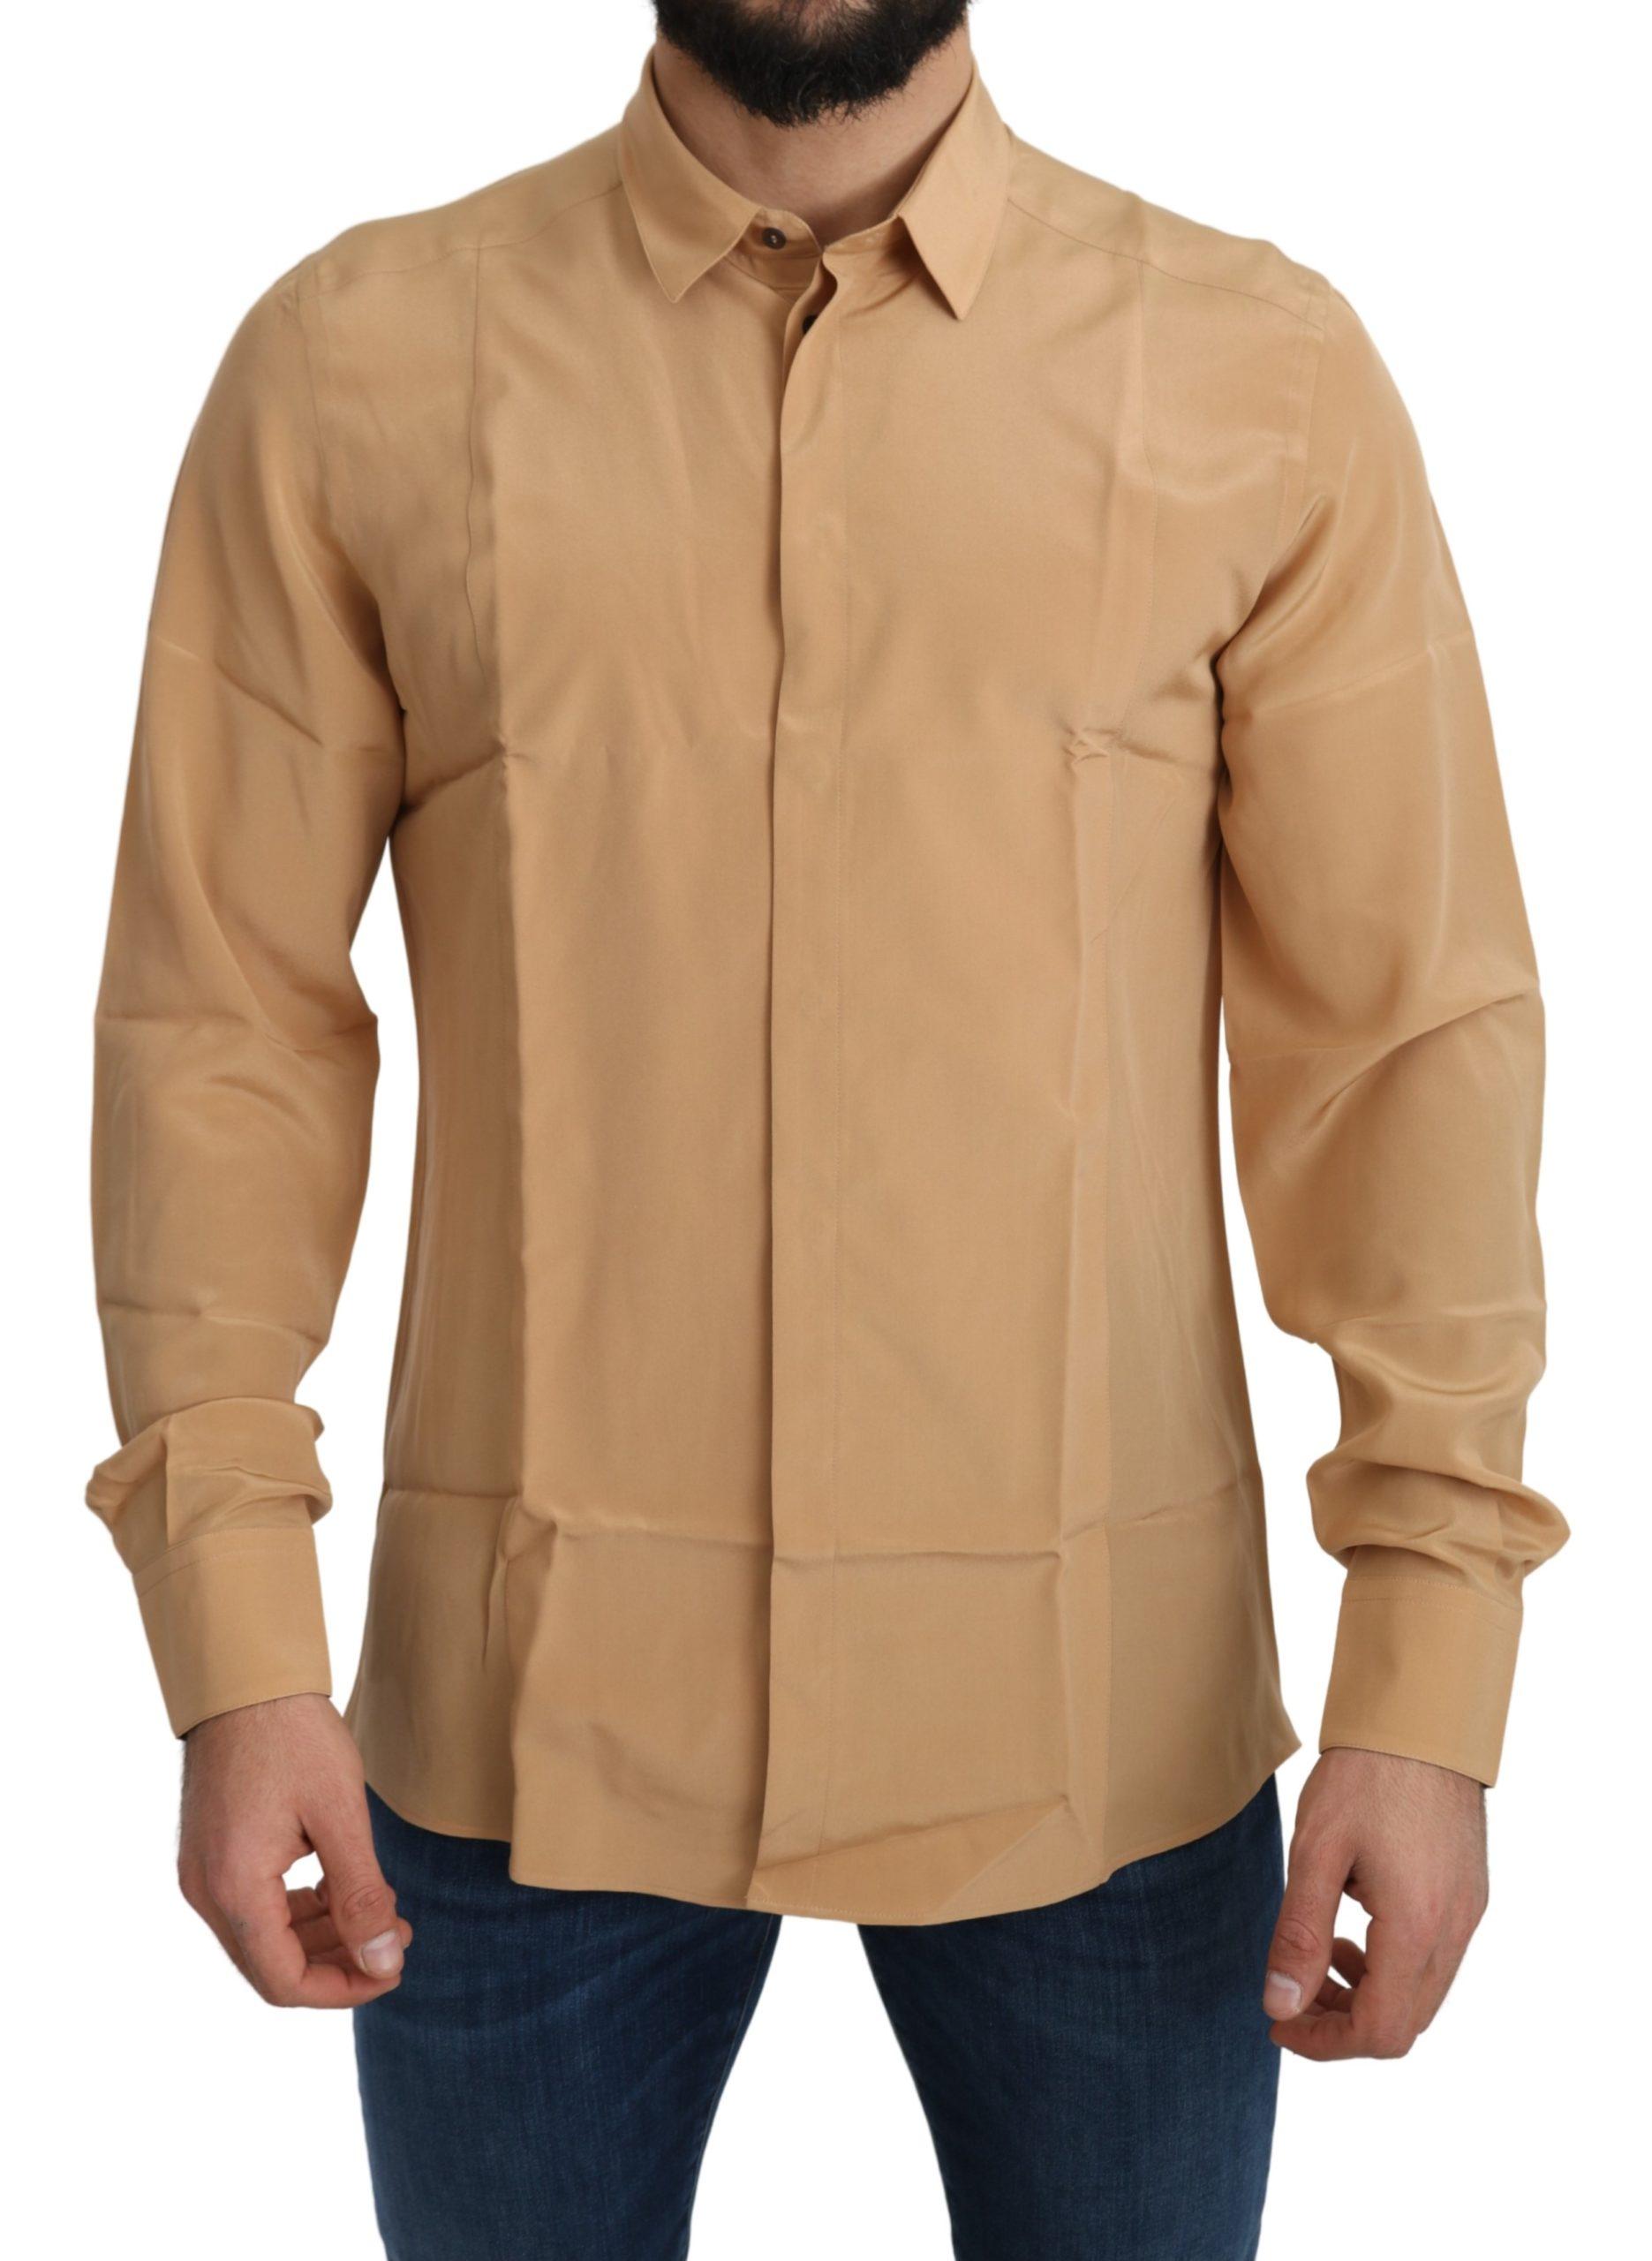 Dolce & Gabbana Men's Silk Slim Shirt Yellow TSH5213 - IT40   M